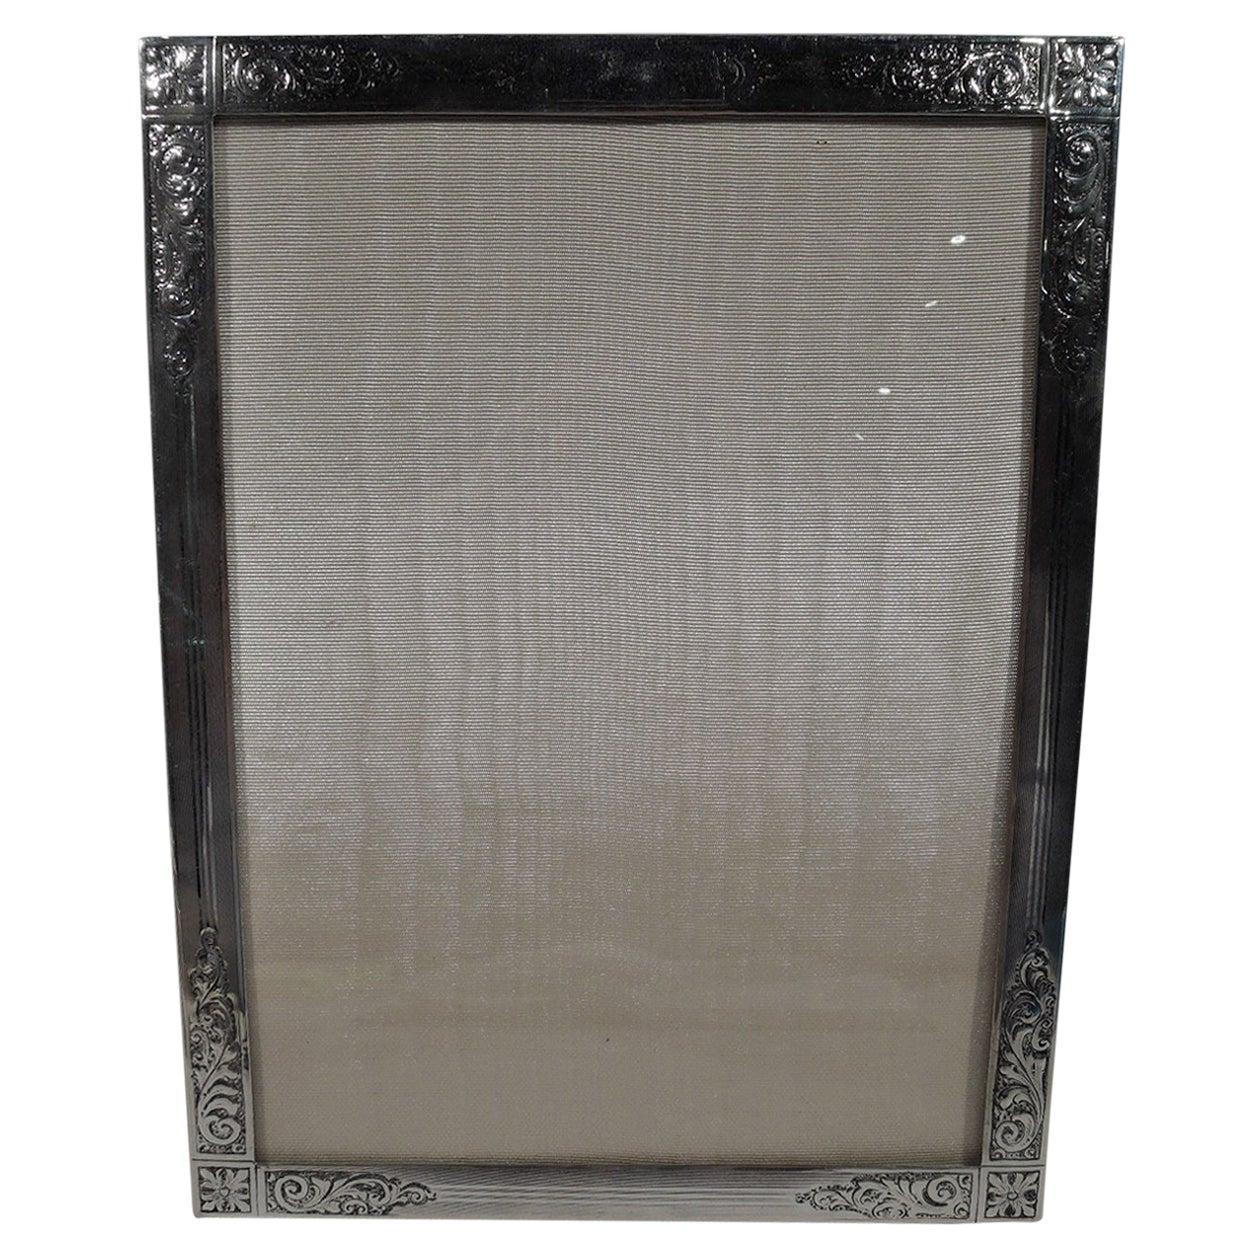 Antique Edwardian Sterling Silver Picture Frame by Birks